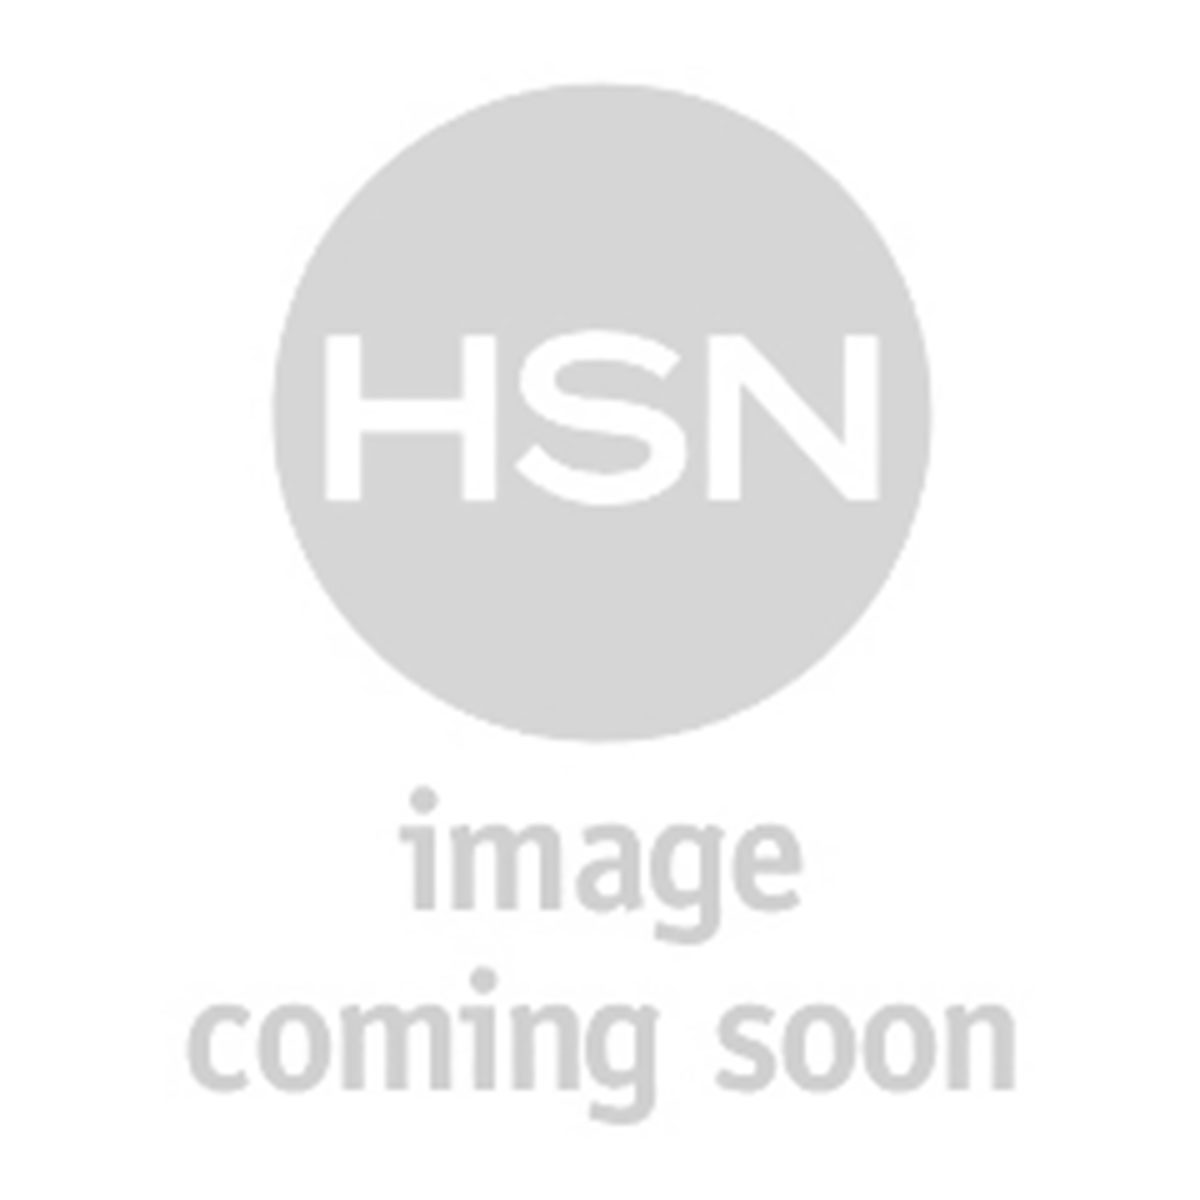 safavieh cowhide leather rug 4 6 x 6 6